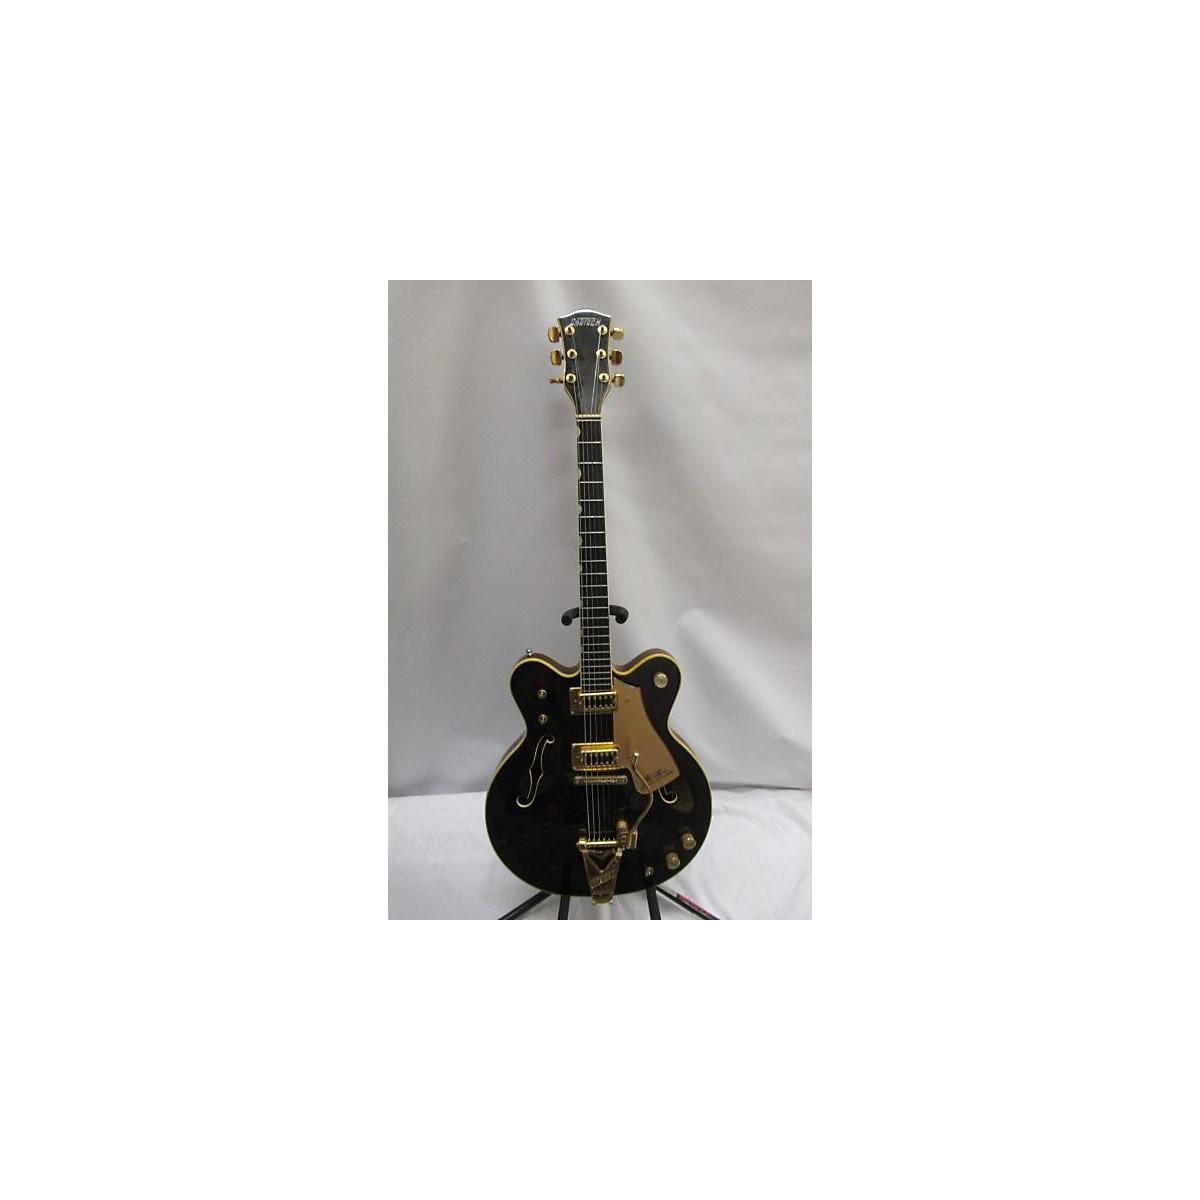 Gretsch Guitars 1976 7670 Country Gentleman OHSC Hollow Body Electric Guitar